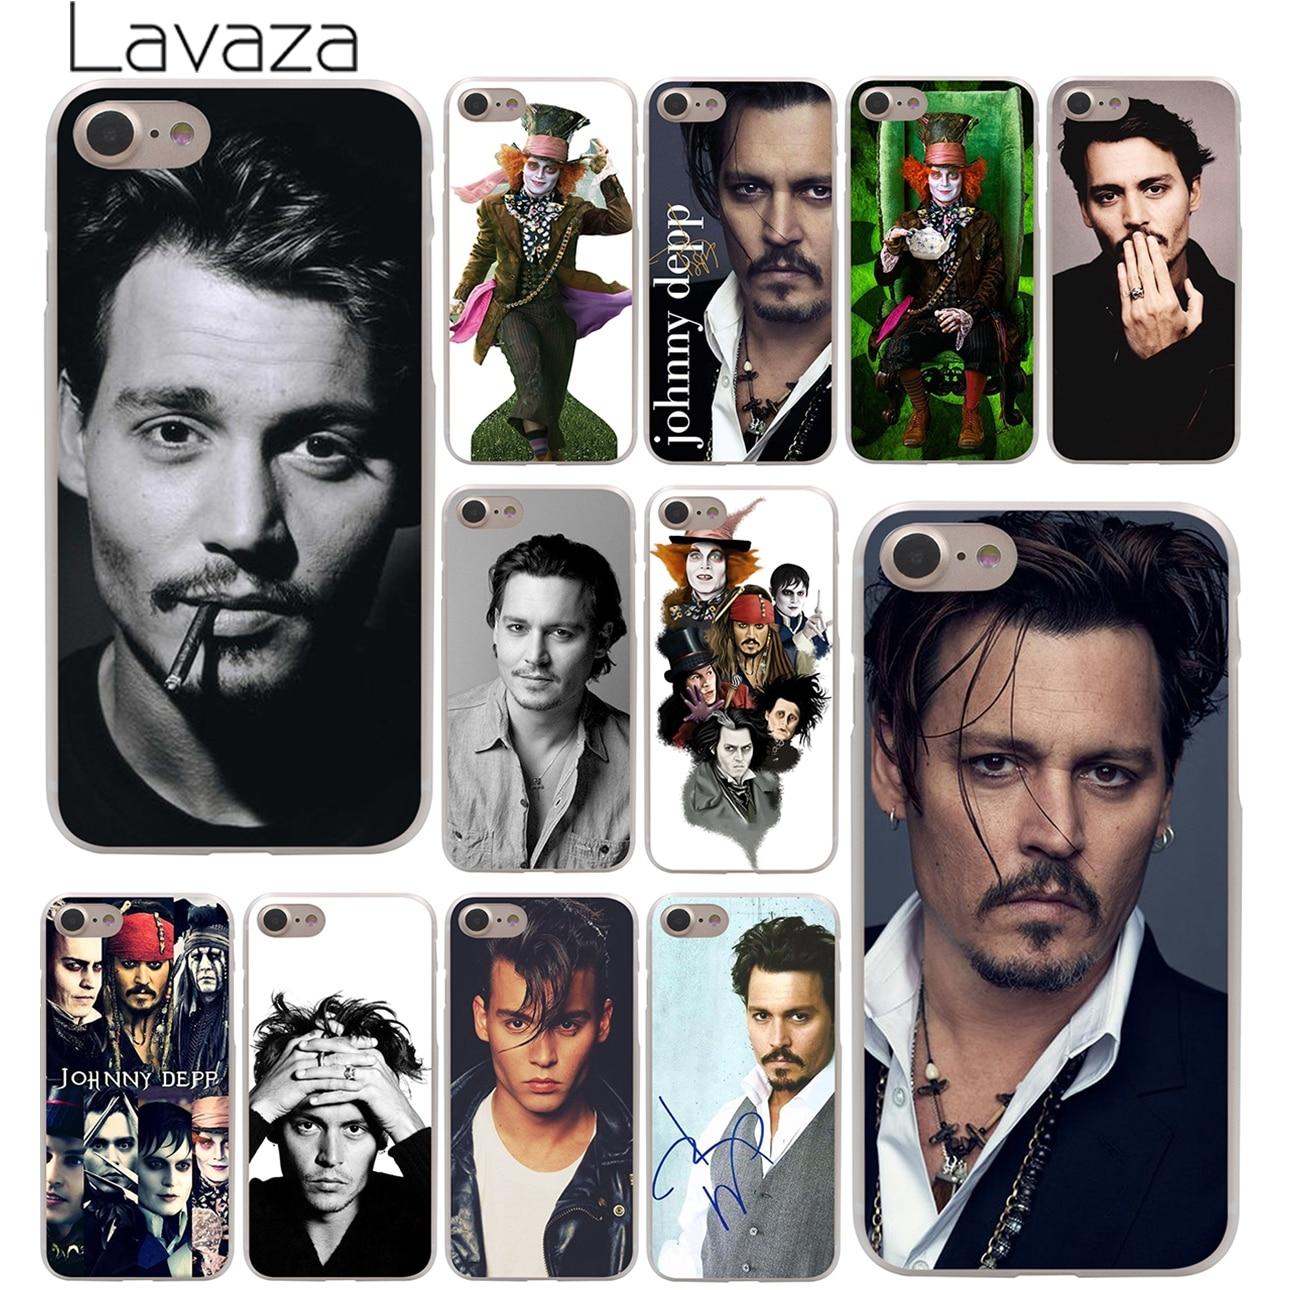 Lavaza johnny depp Hard Phone Cover Case for Apple iPhone 10 X 8 7 6 6s Plus 5 5S SE 5C  ...